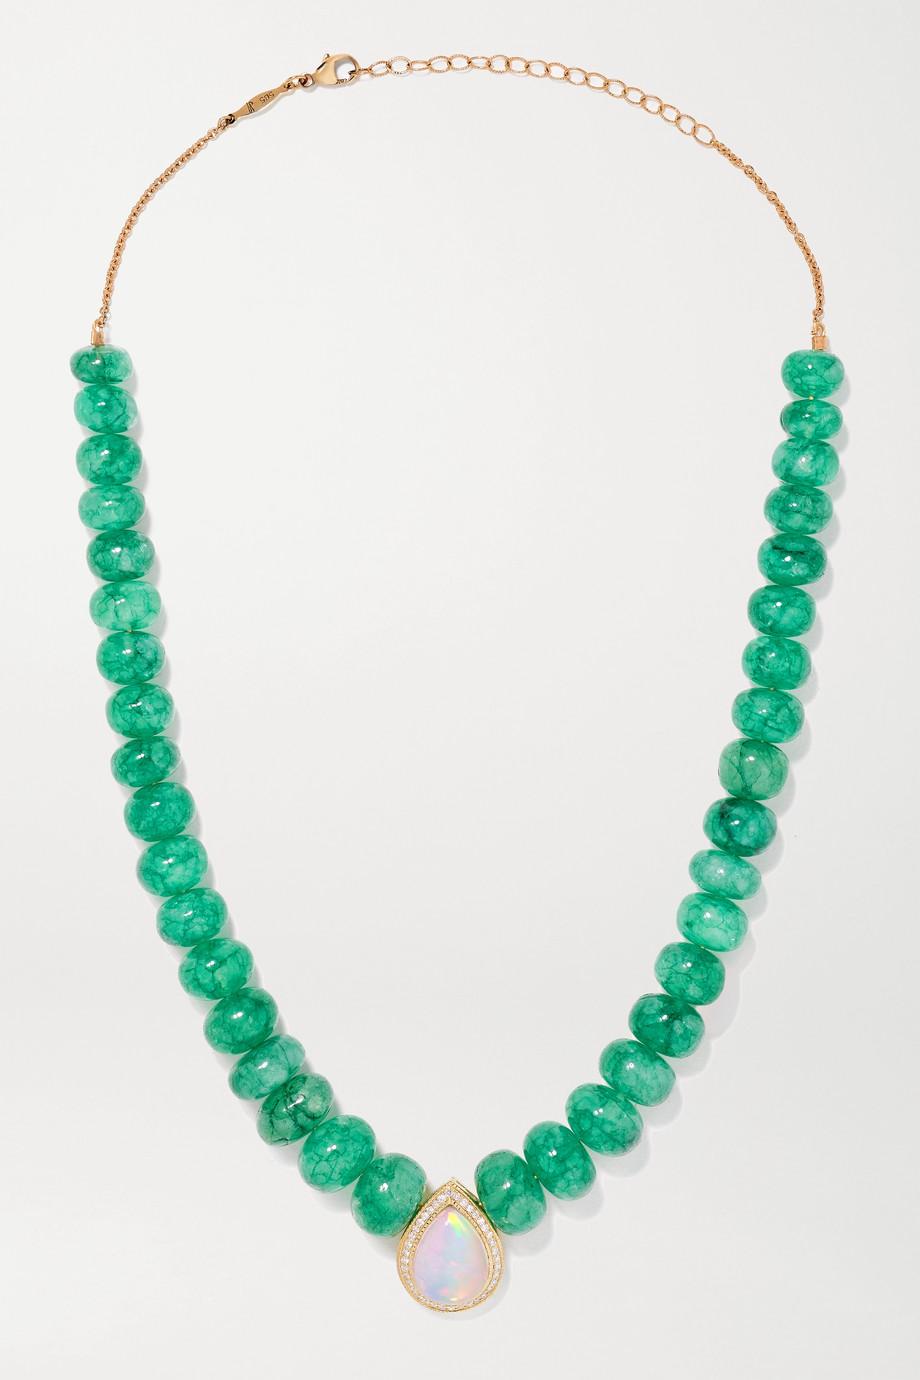 Jacquie Aiche 14-karat gold multi-stone necklace